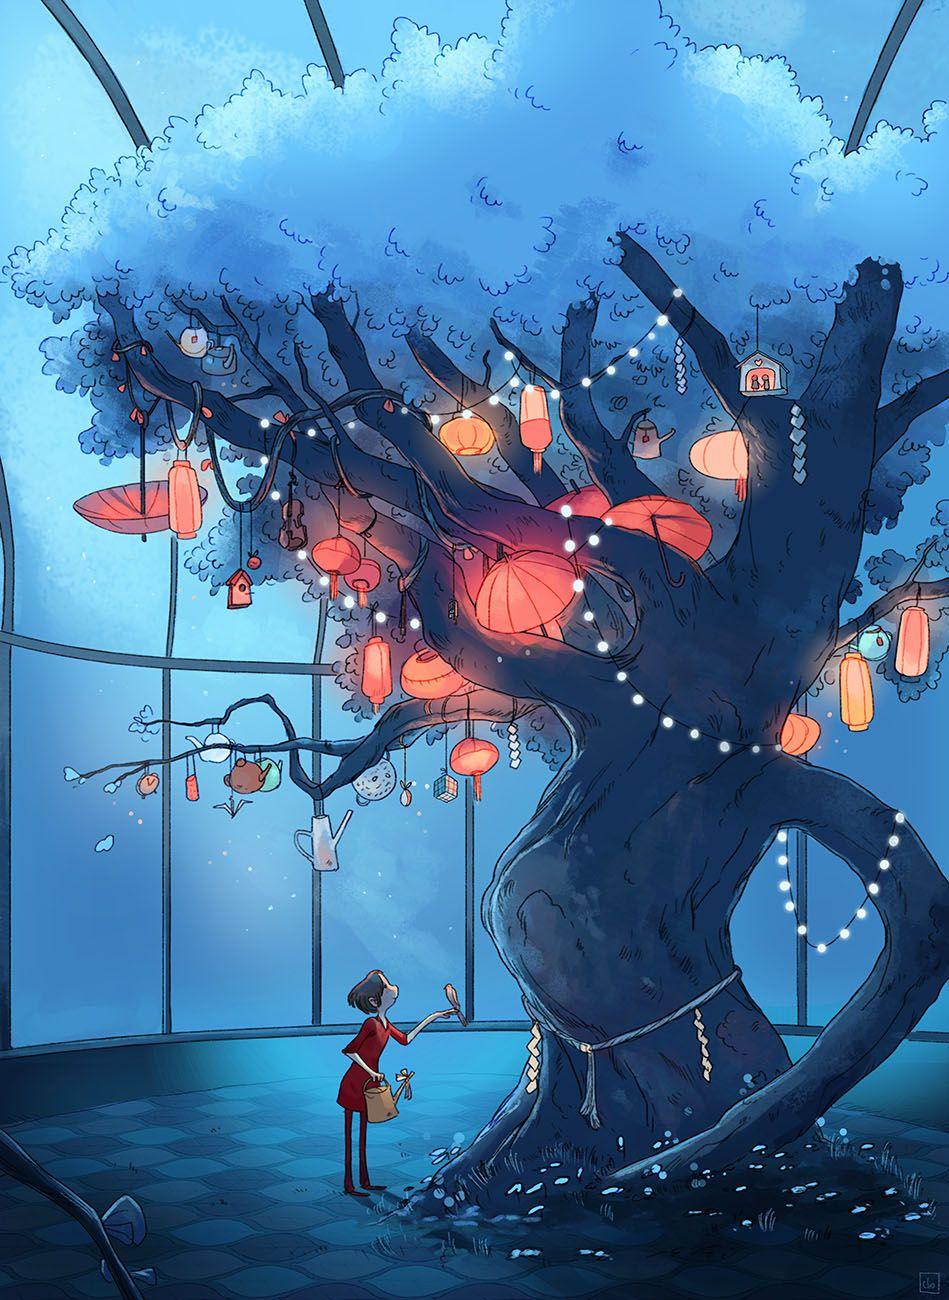 Aurélie Neyret illustration